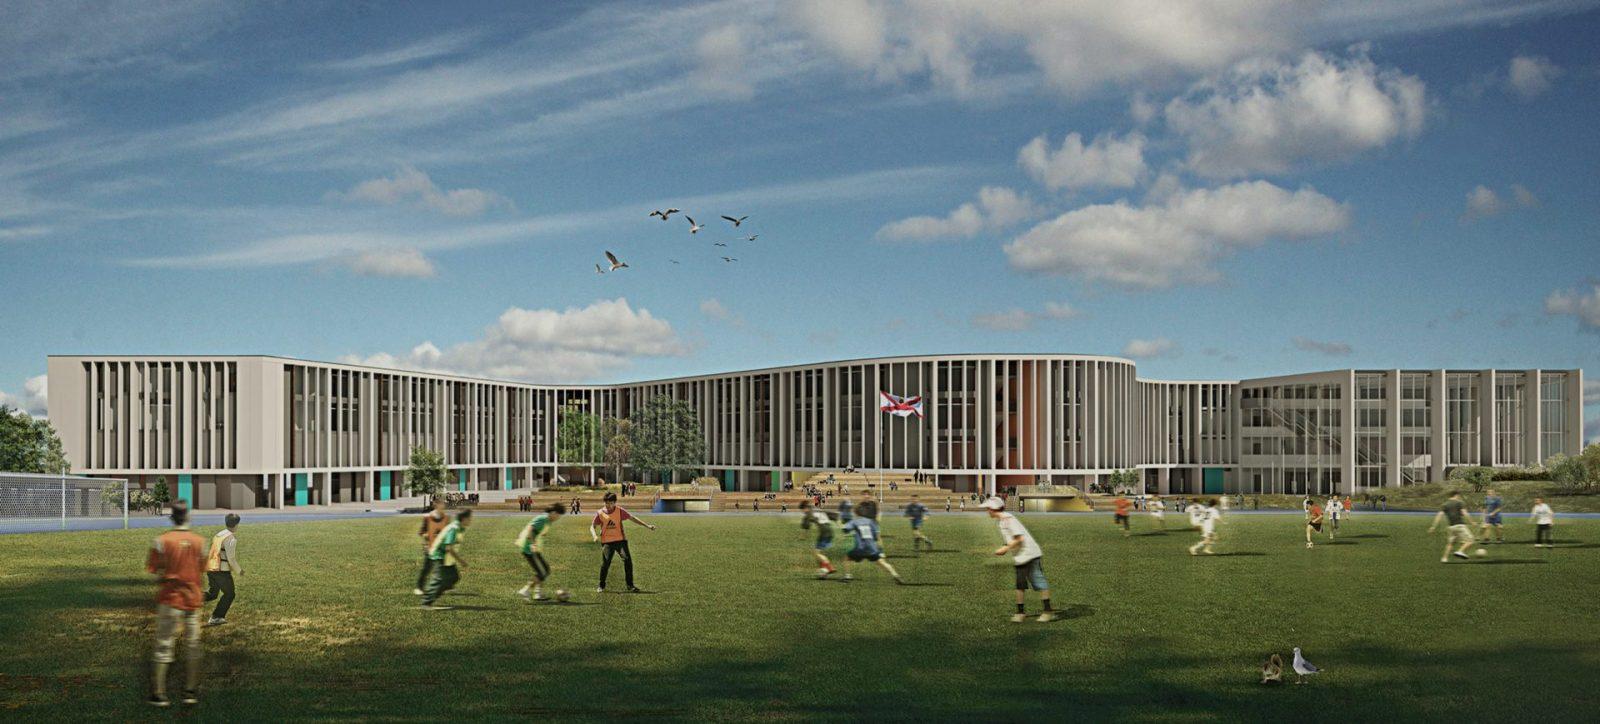 les quennavais school modern architecture st brelade jersey architecture4 1